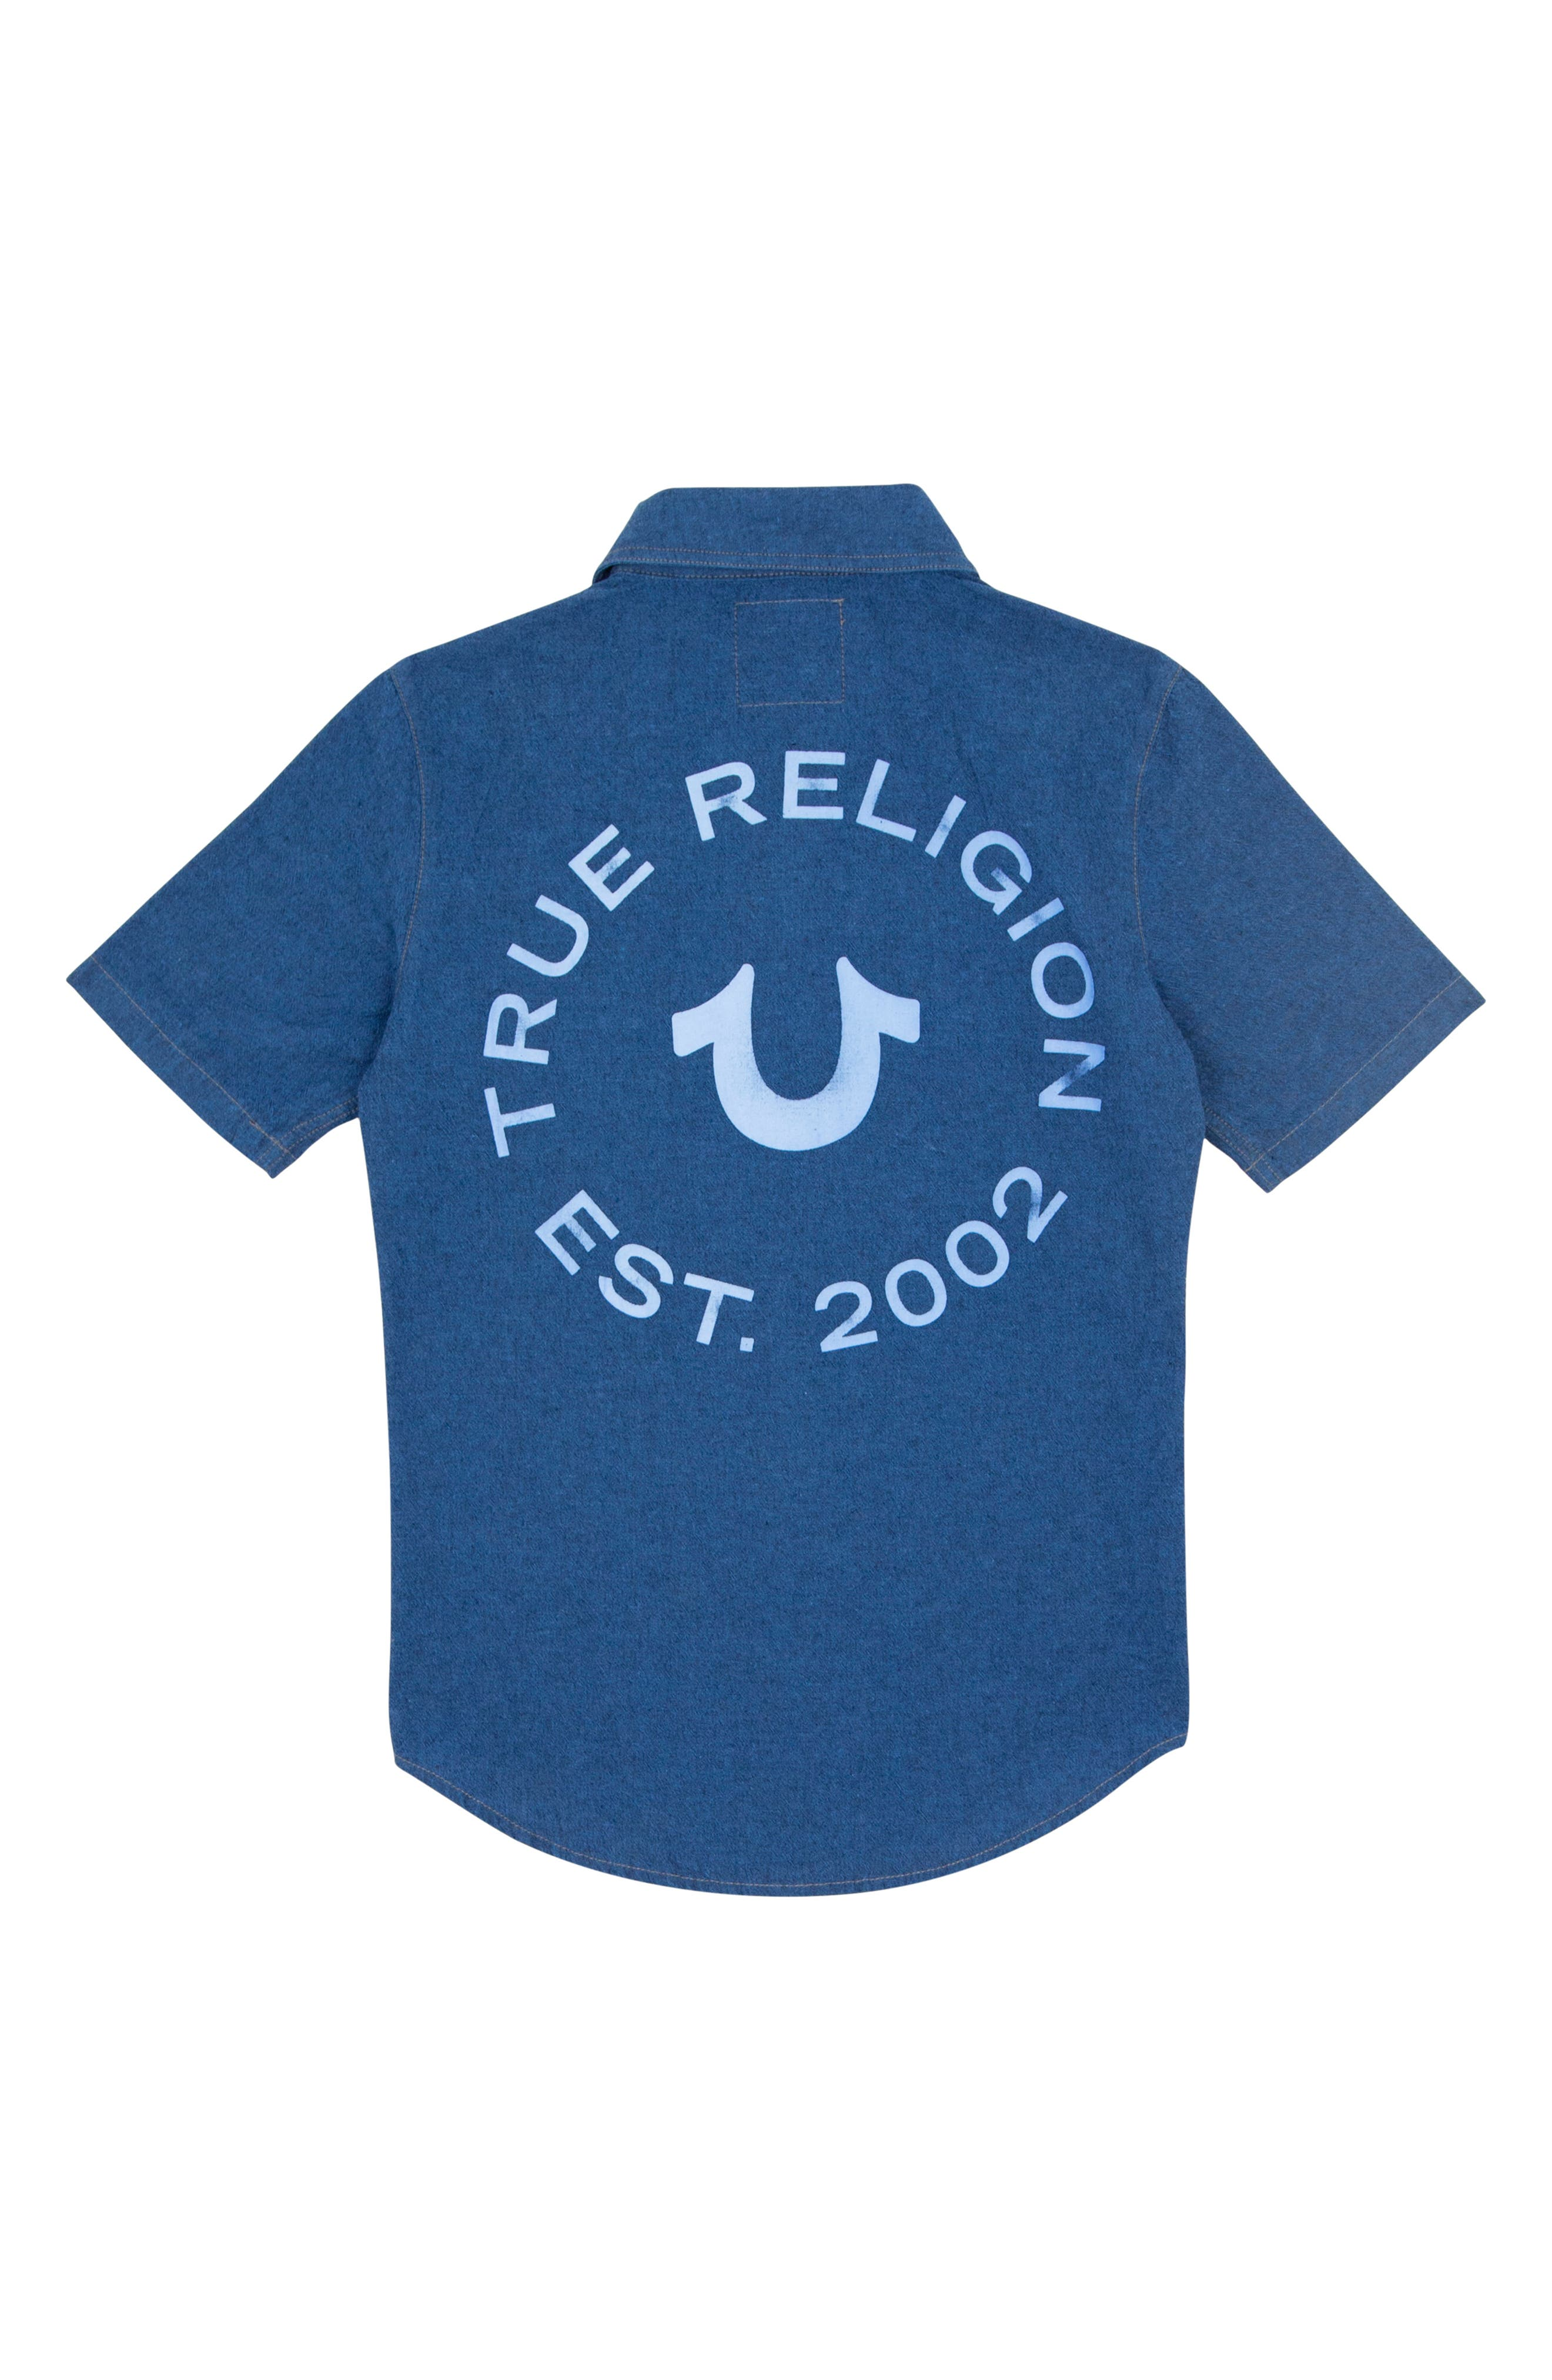 Woven Shirt,                             Alternate thumbnail 2, color,                             ROYAL BLUE